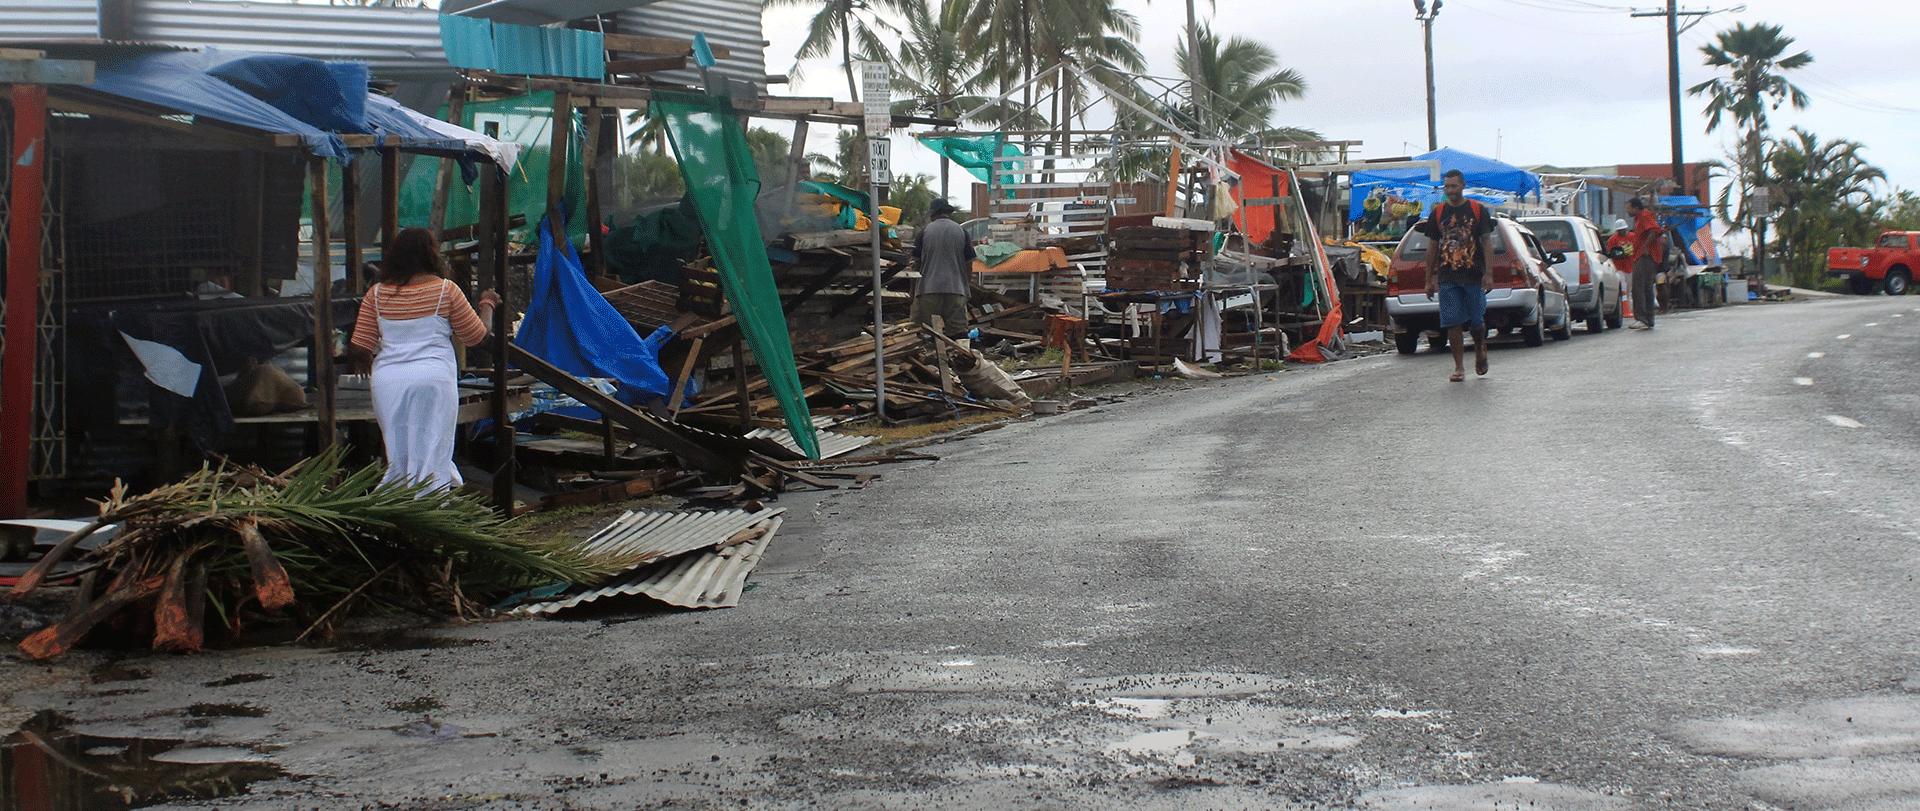 homepage-slider-cyclone-winston-blog-crops-washed-away-1920-devastated-markets-2-fiji